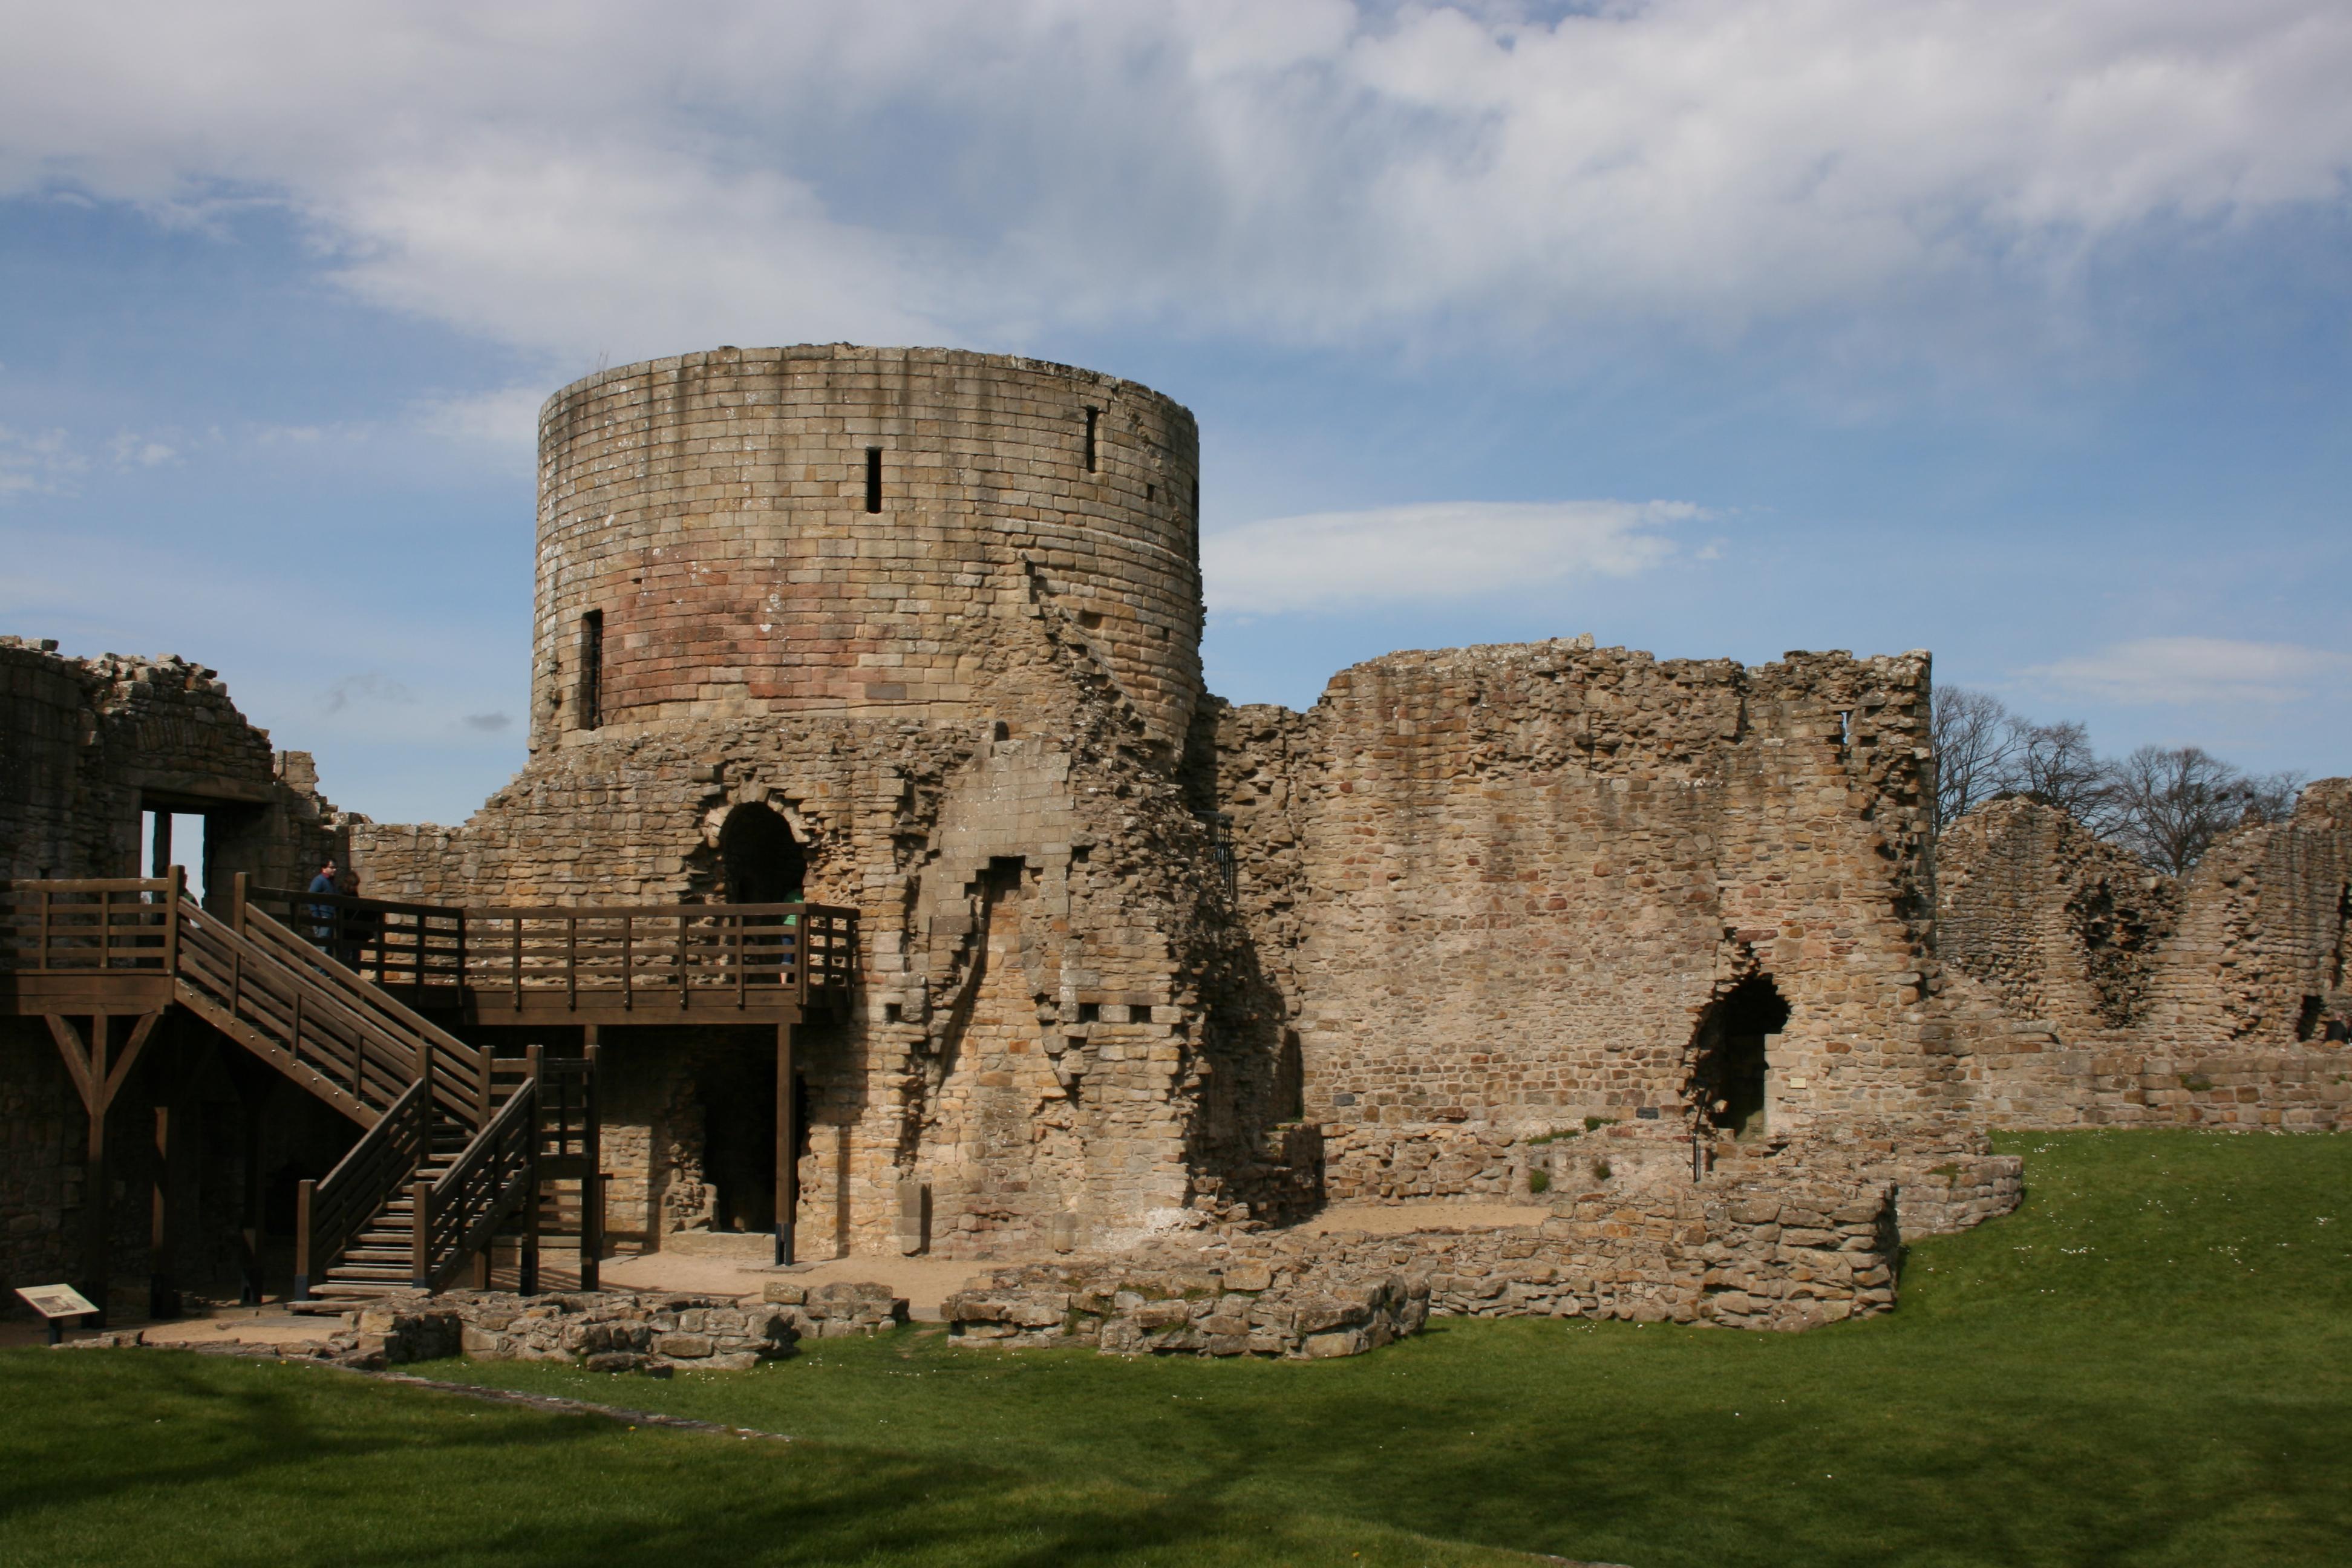 https://upload.wikimedia.org/wikipedia/commons/1/19/Barnard_Castle's_round_tower_(2),_2007.jpg